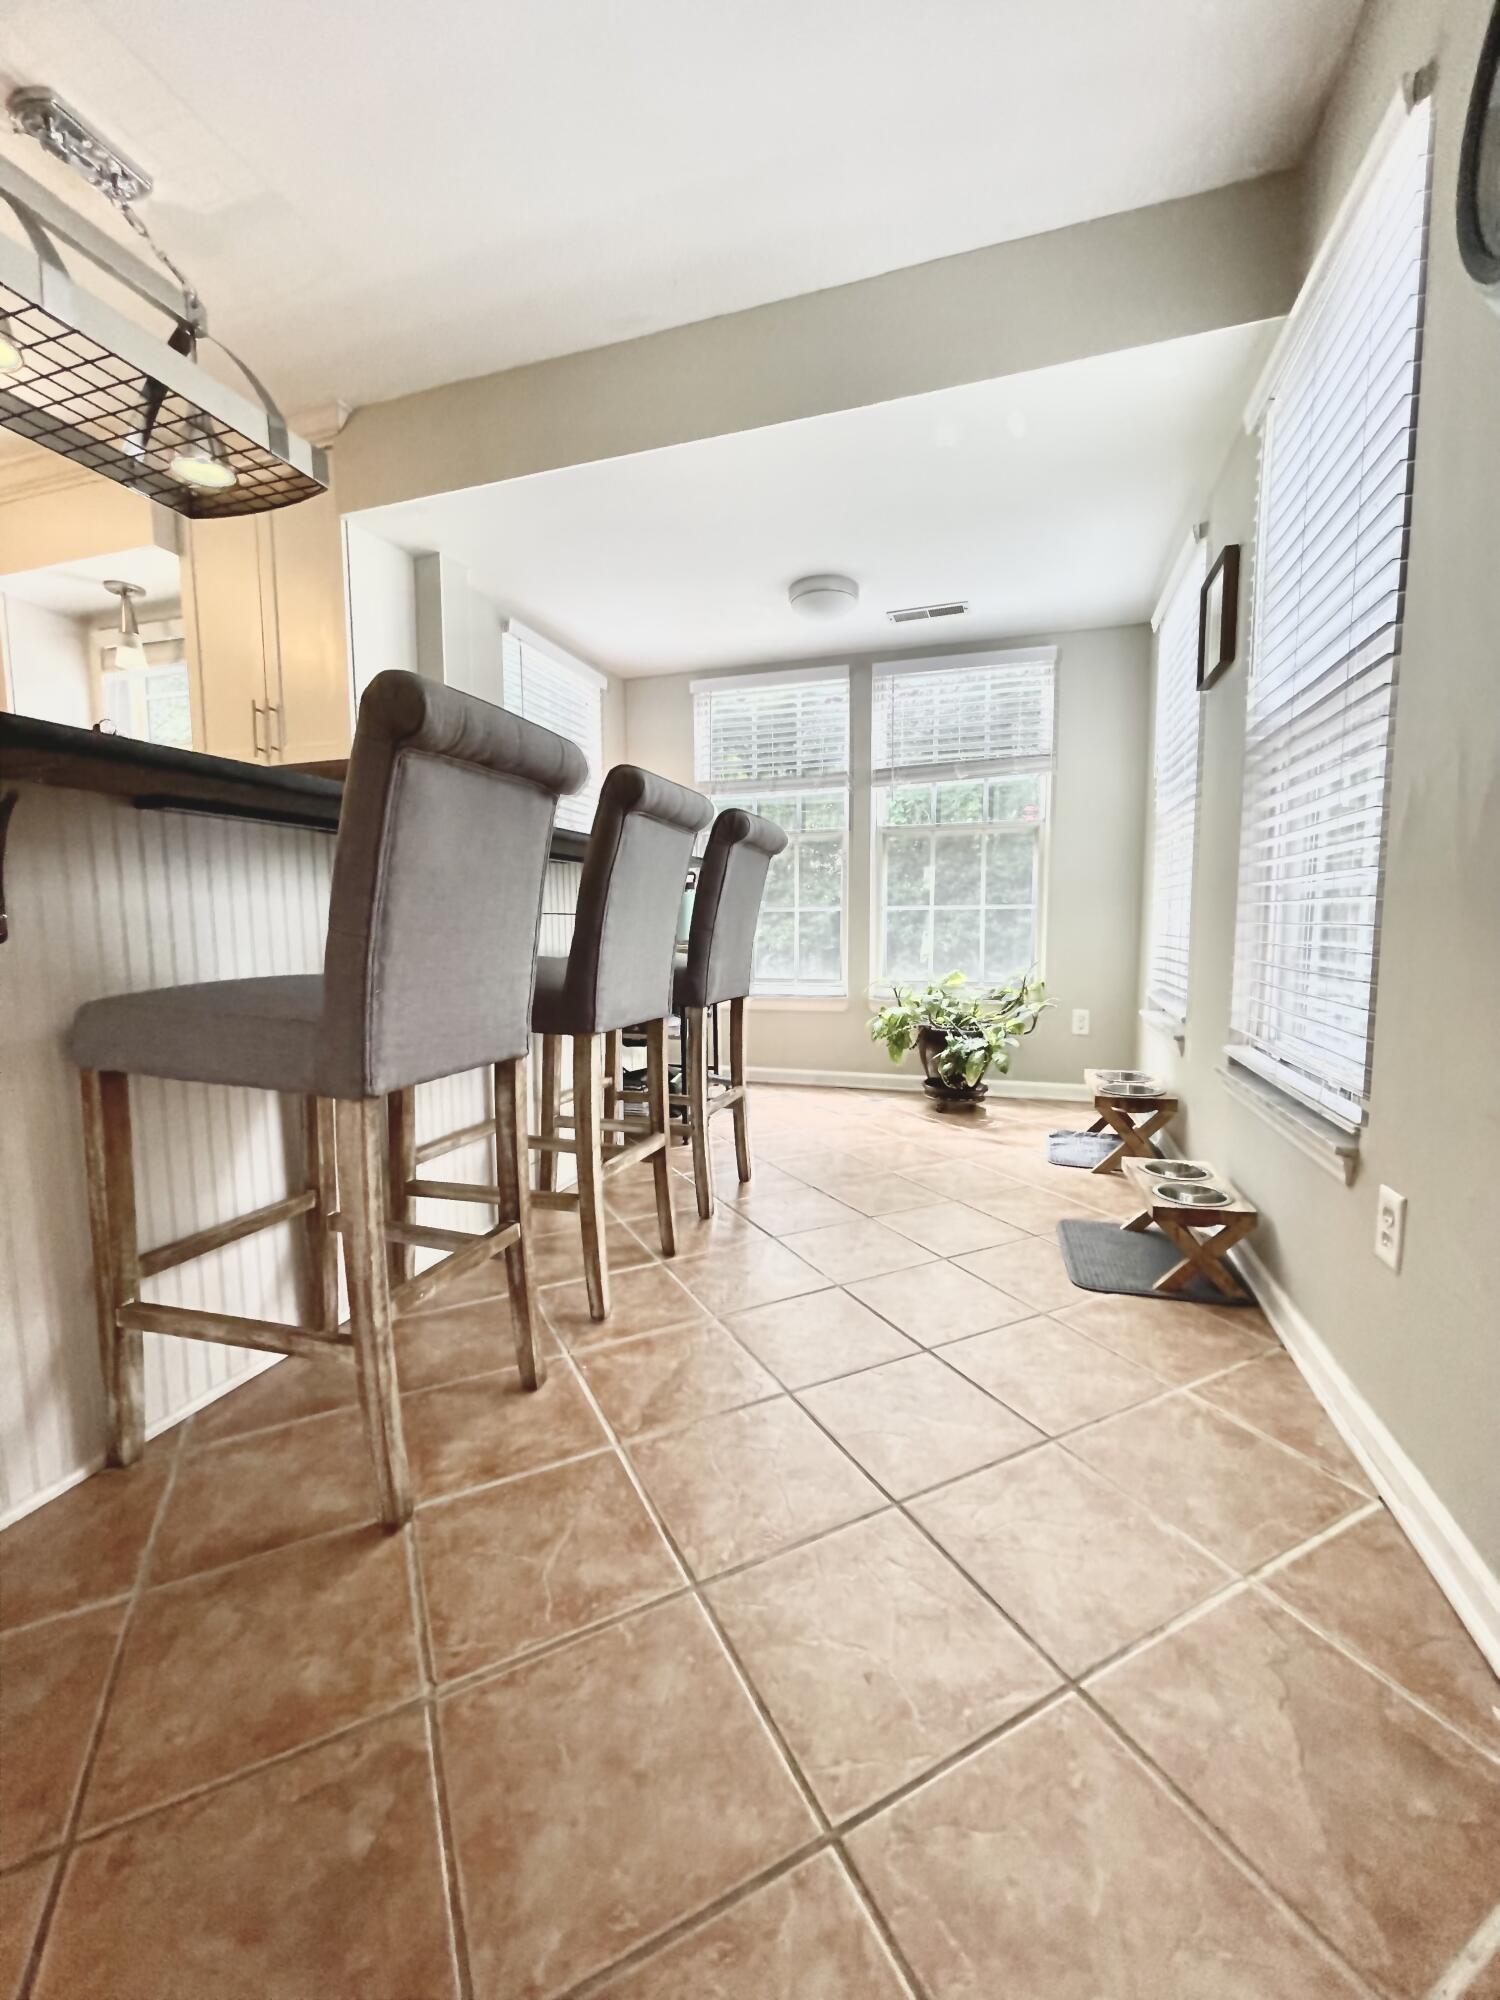 Quail Hollow Homes For Sale - 1364 Downsberry, Mount Pleasant, SC - 13